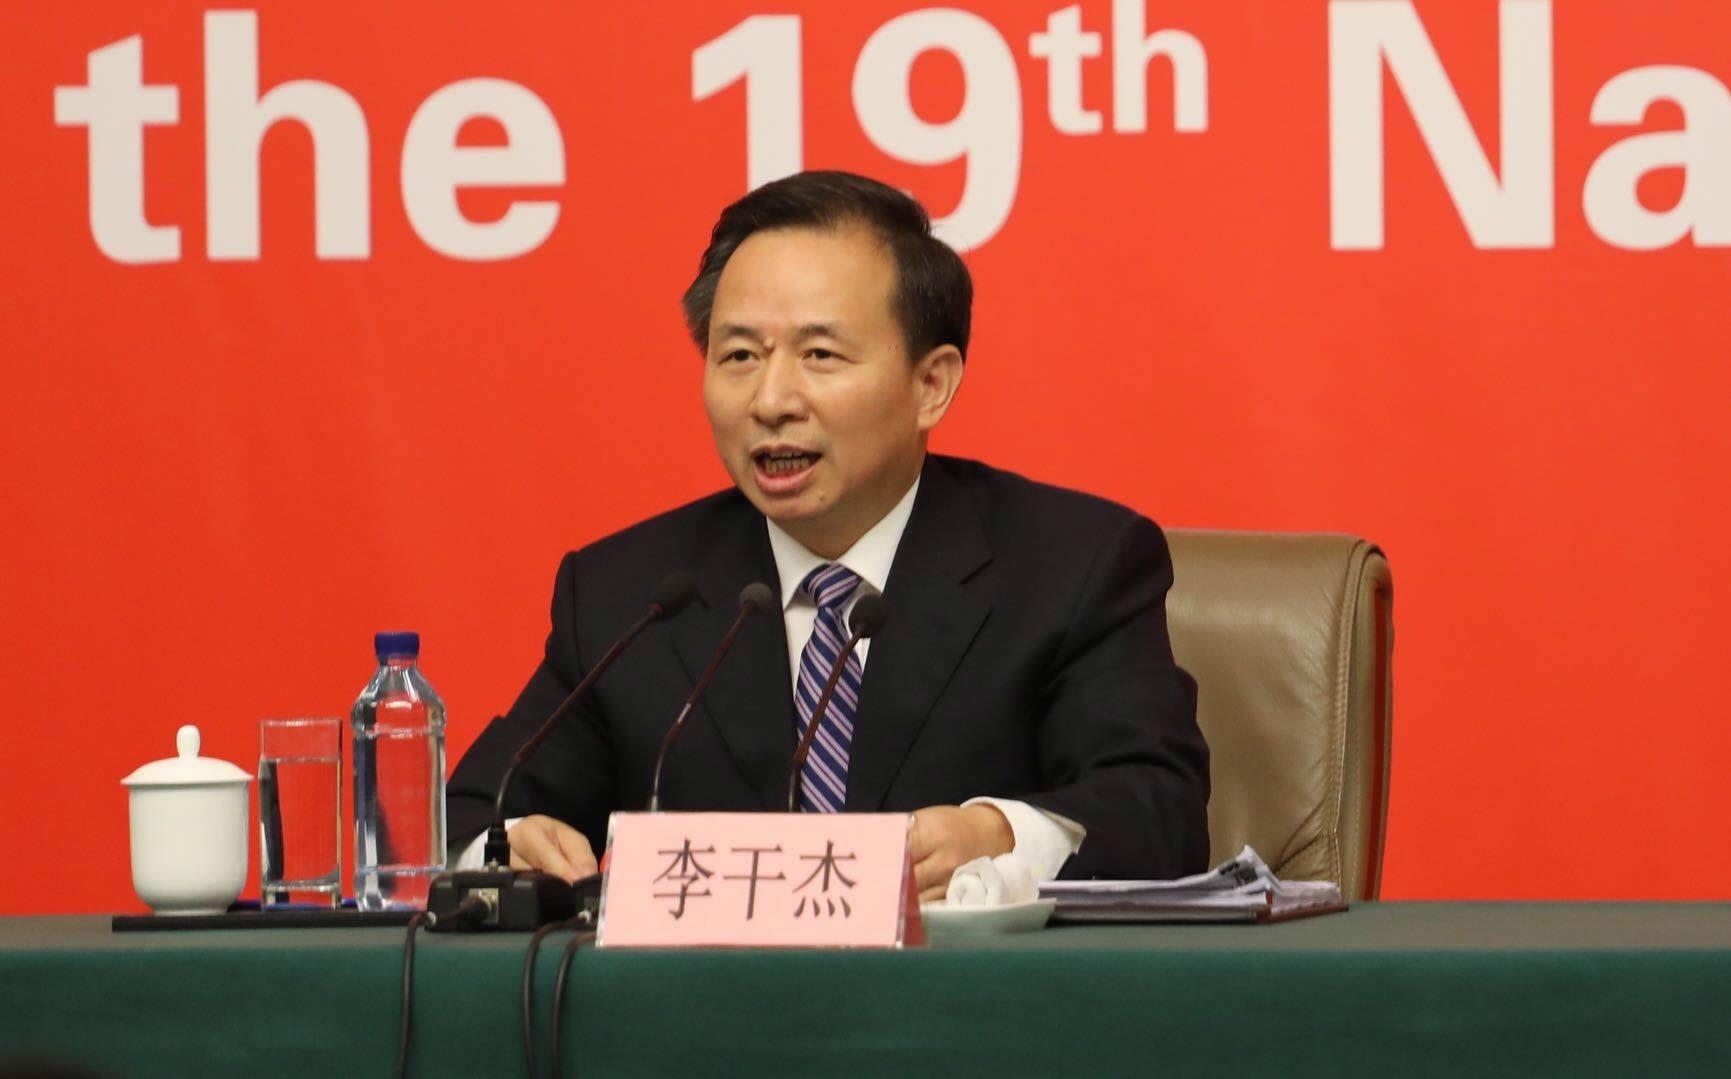 China links pollution strides to economic progress